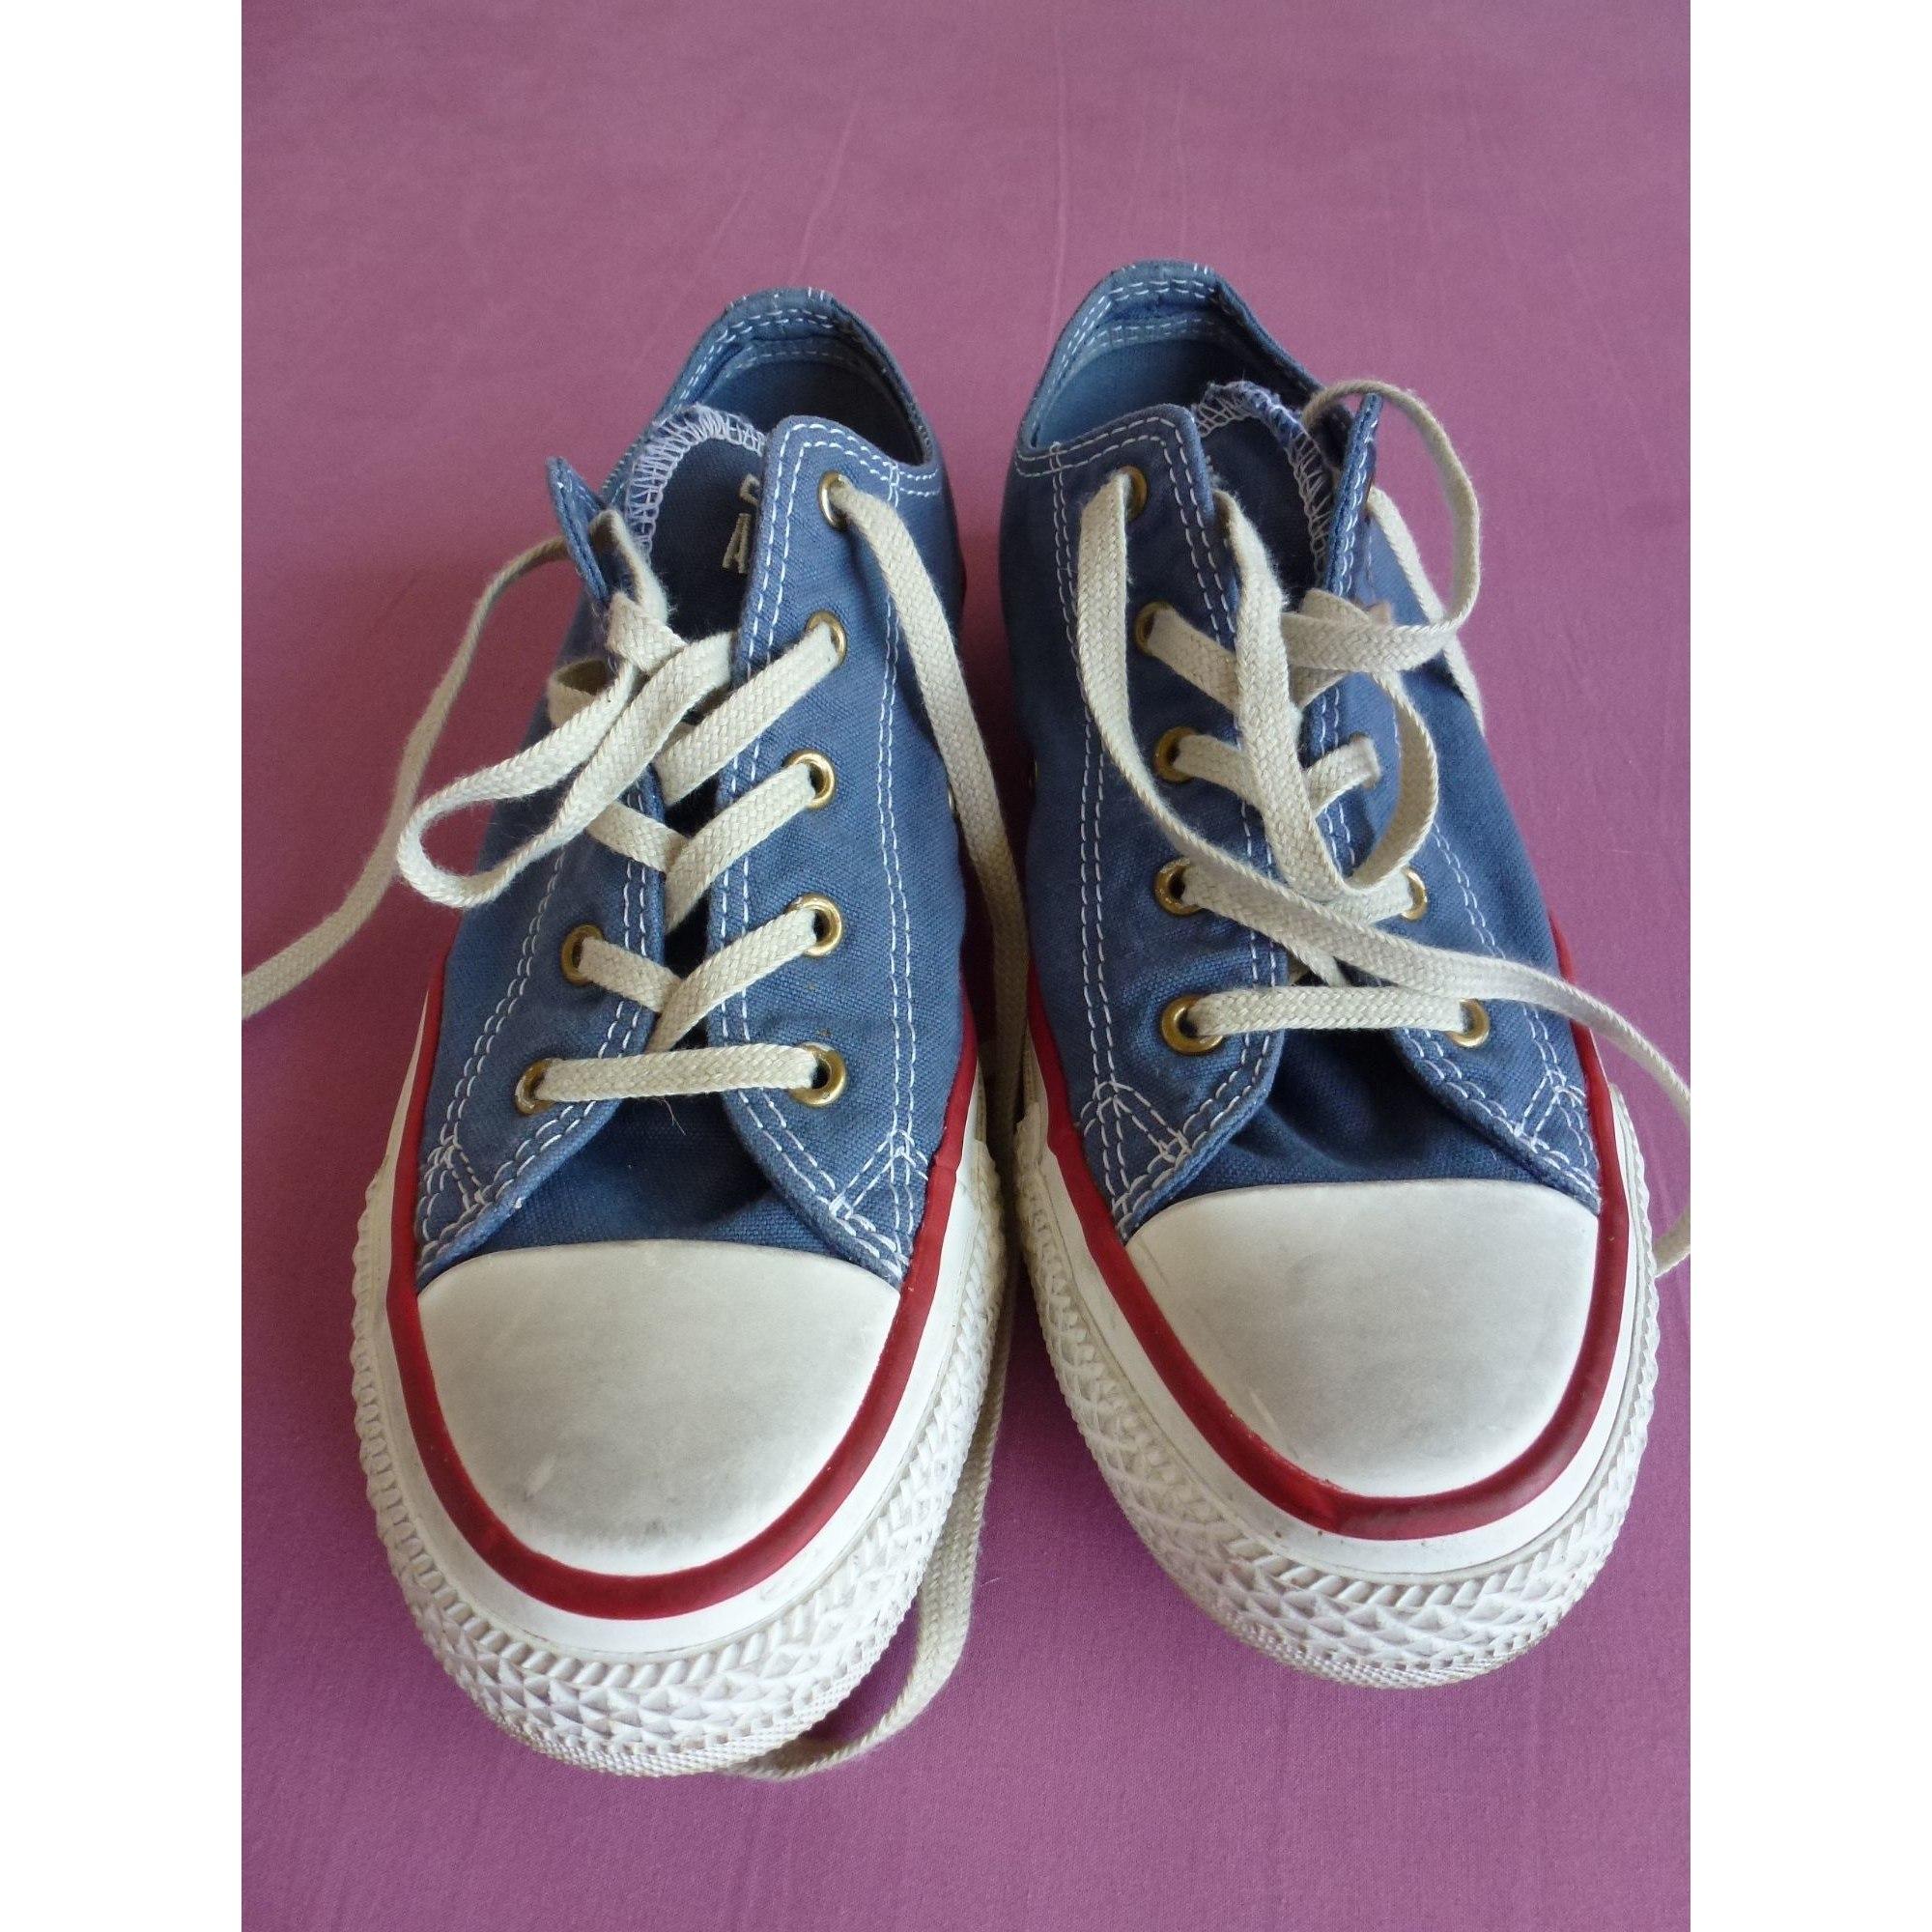 Baskets CONVERSE Bleu, bleu marine, bleu turquoise